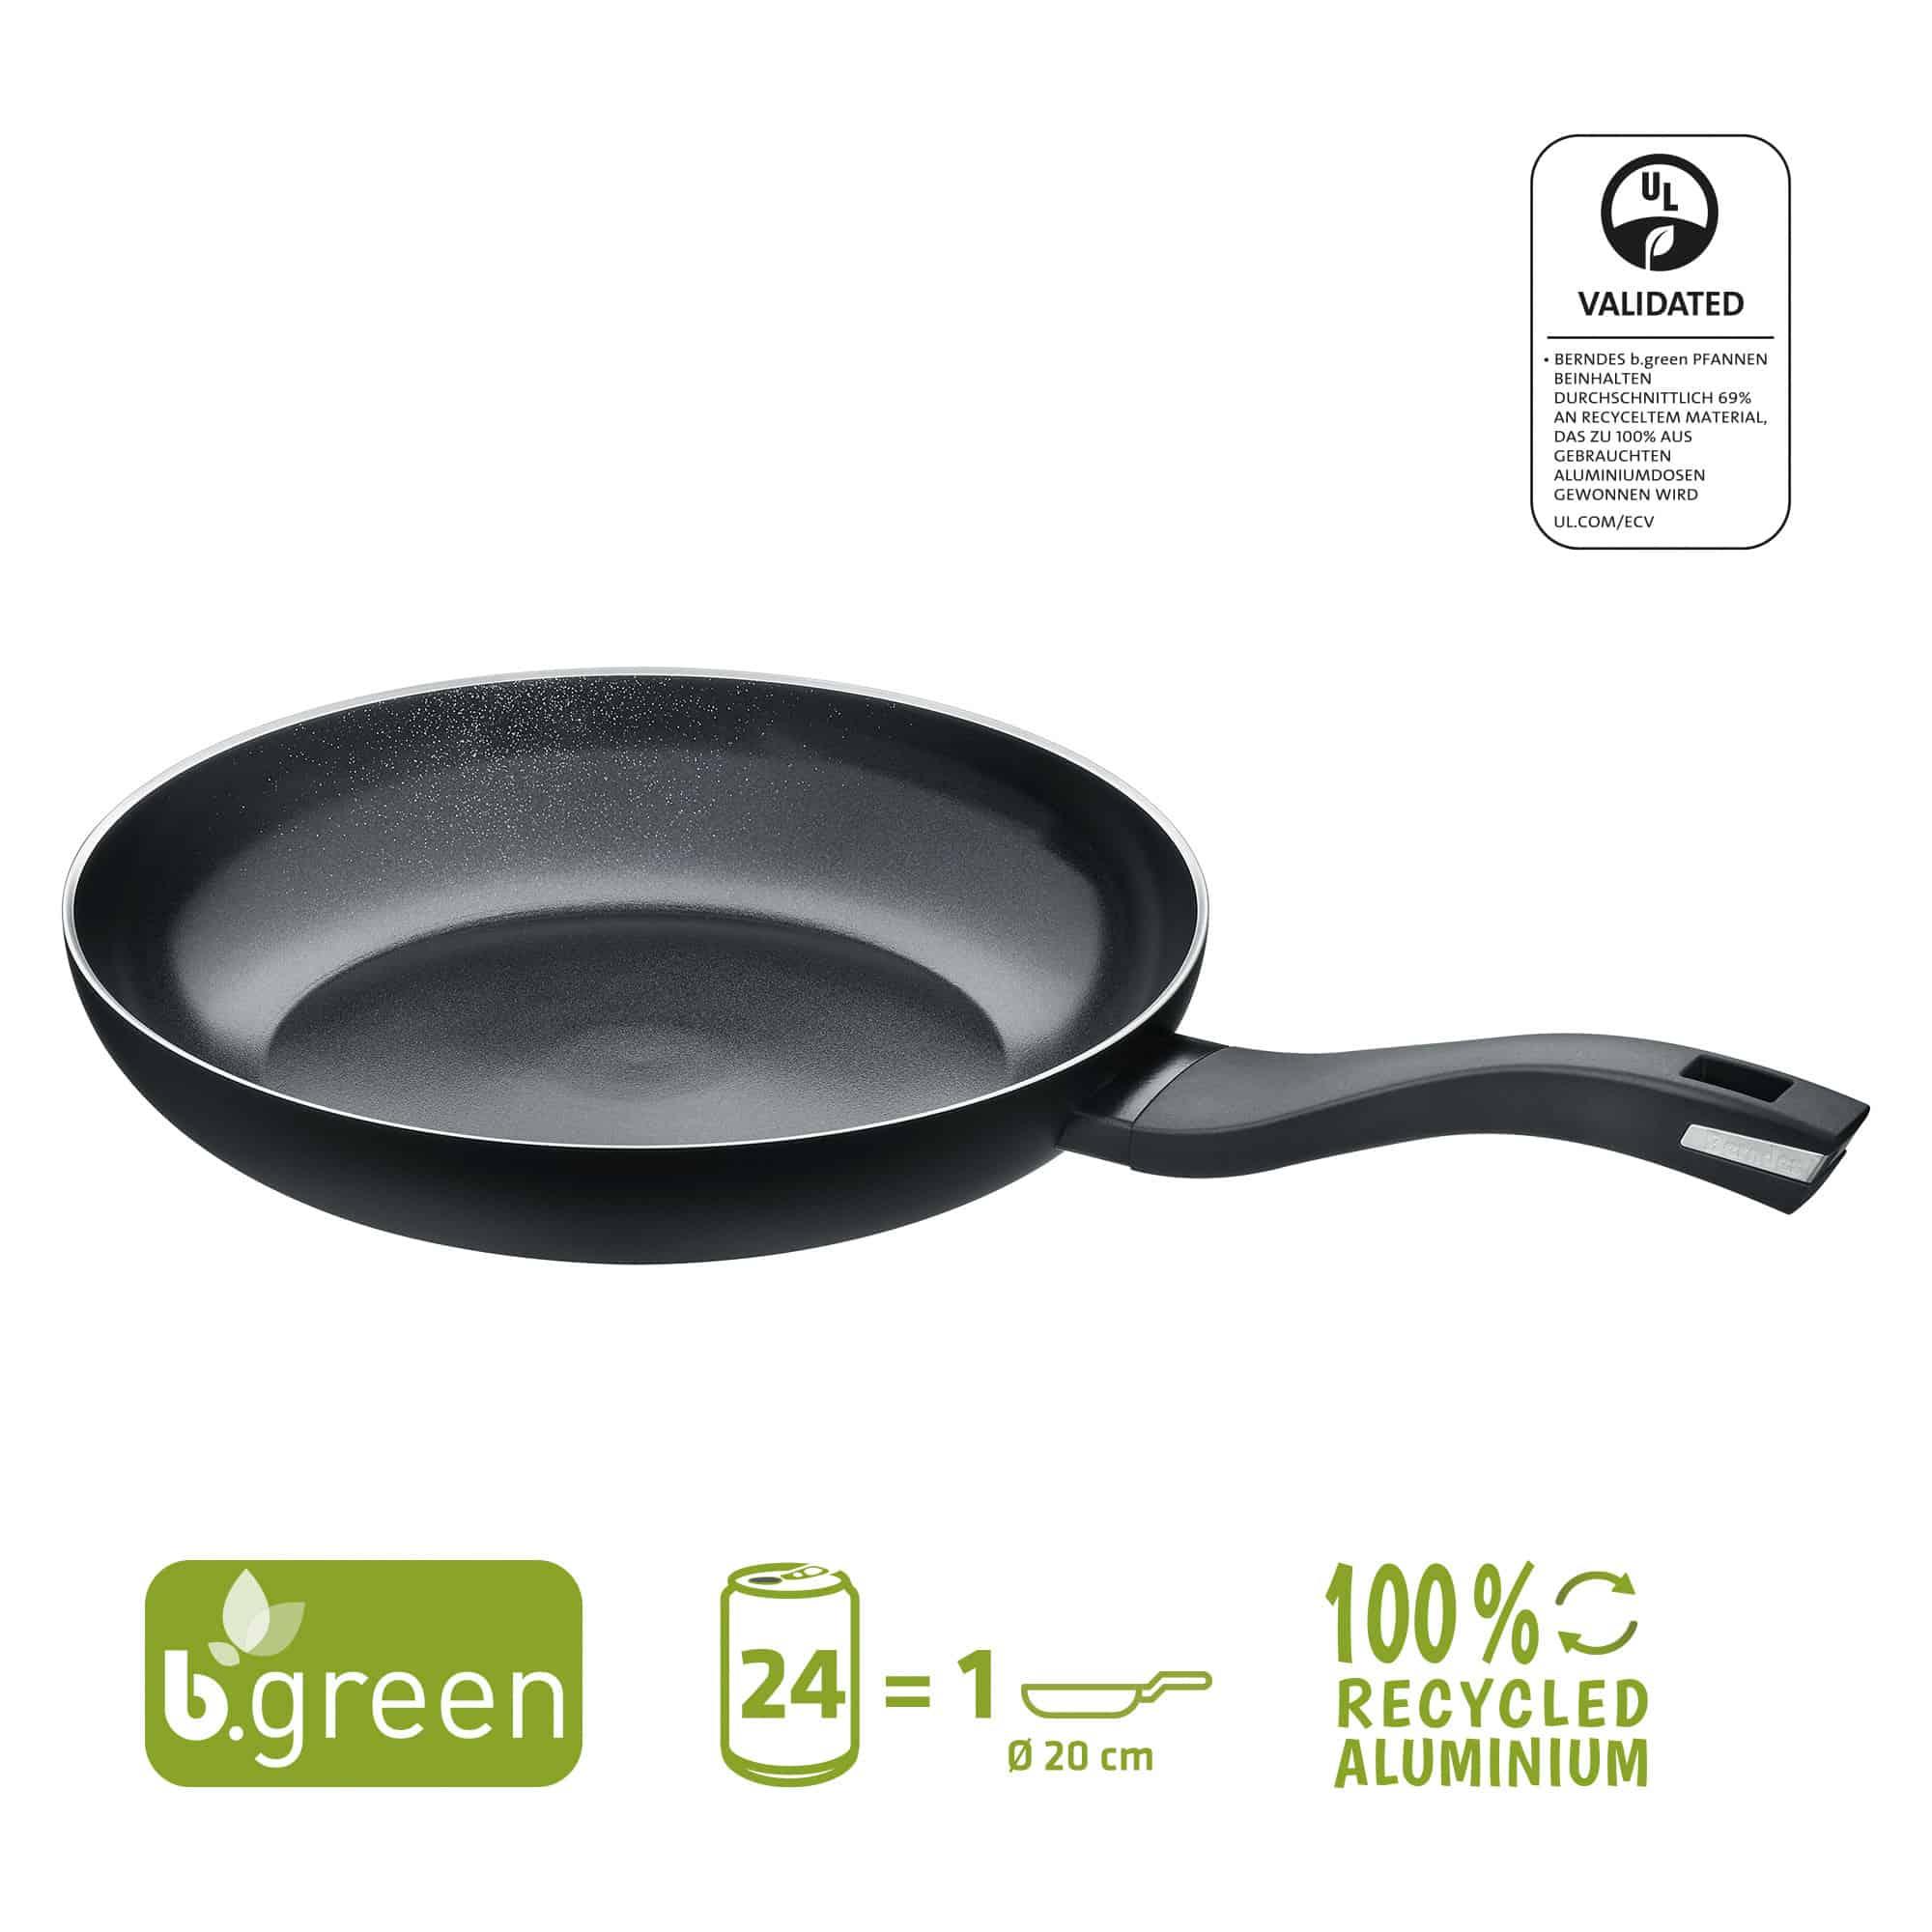 Berndes Bratpfanne b.green Alu Recycled Induction schwarz 20 cm